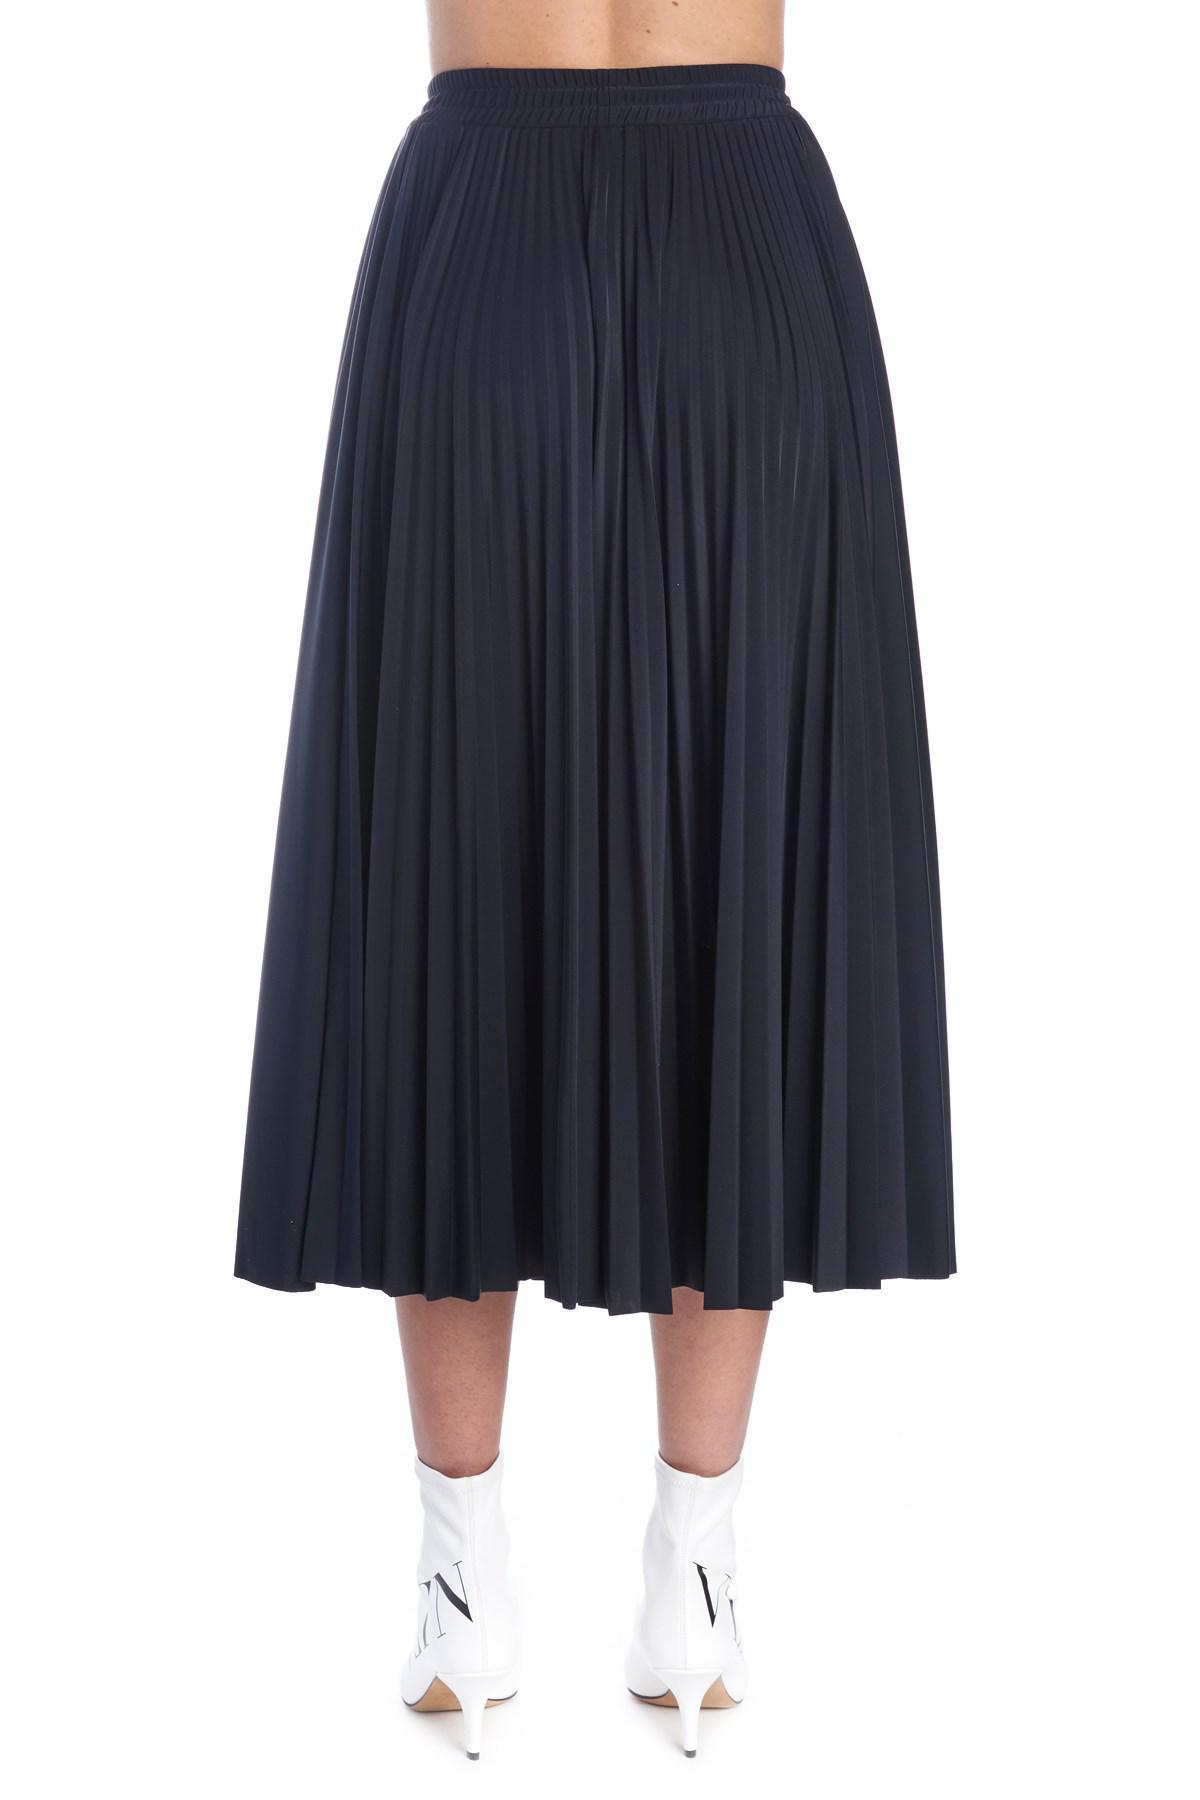 c7e4319e6 Valentino Logo Pleated Midi-skirt in Black - Lyst